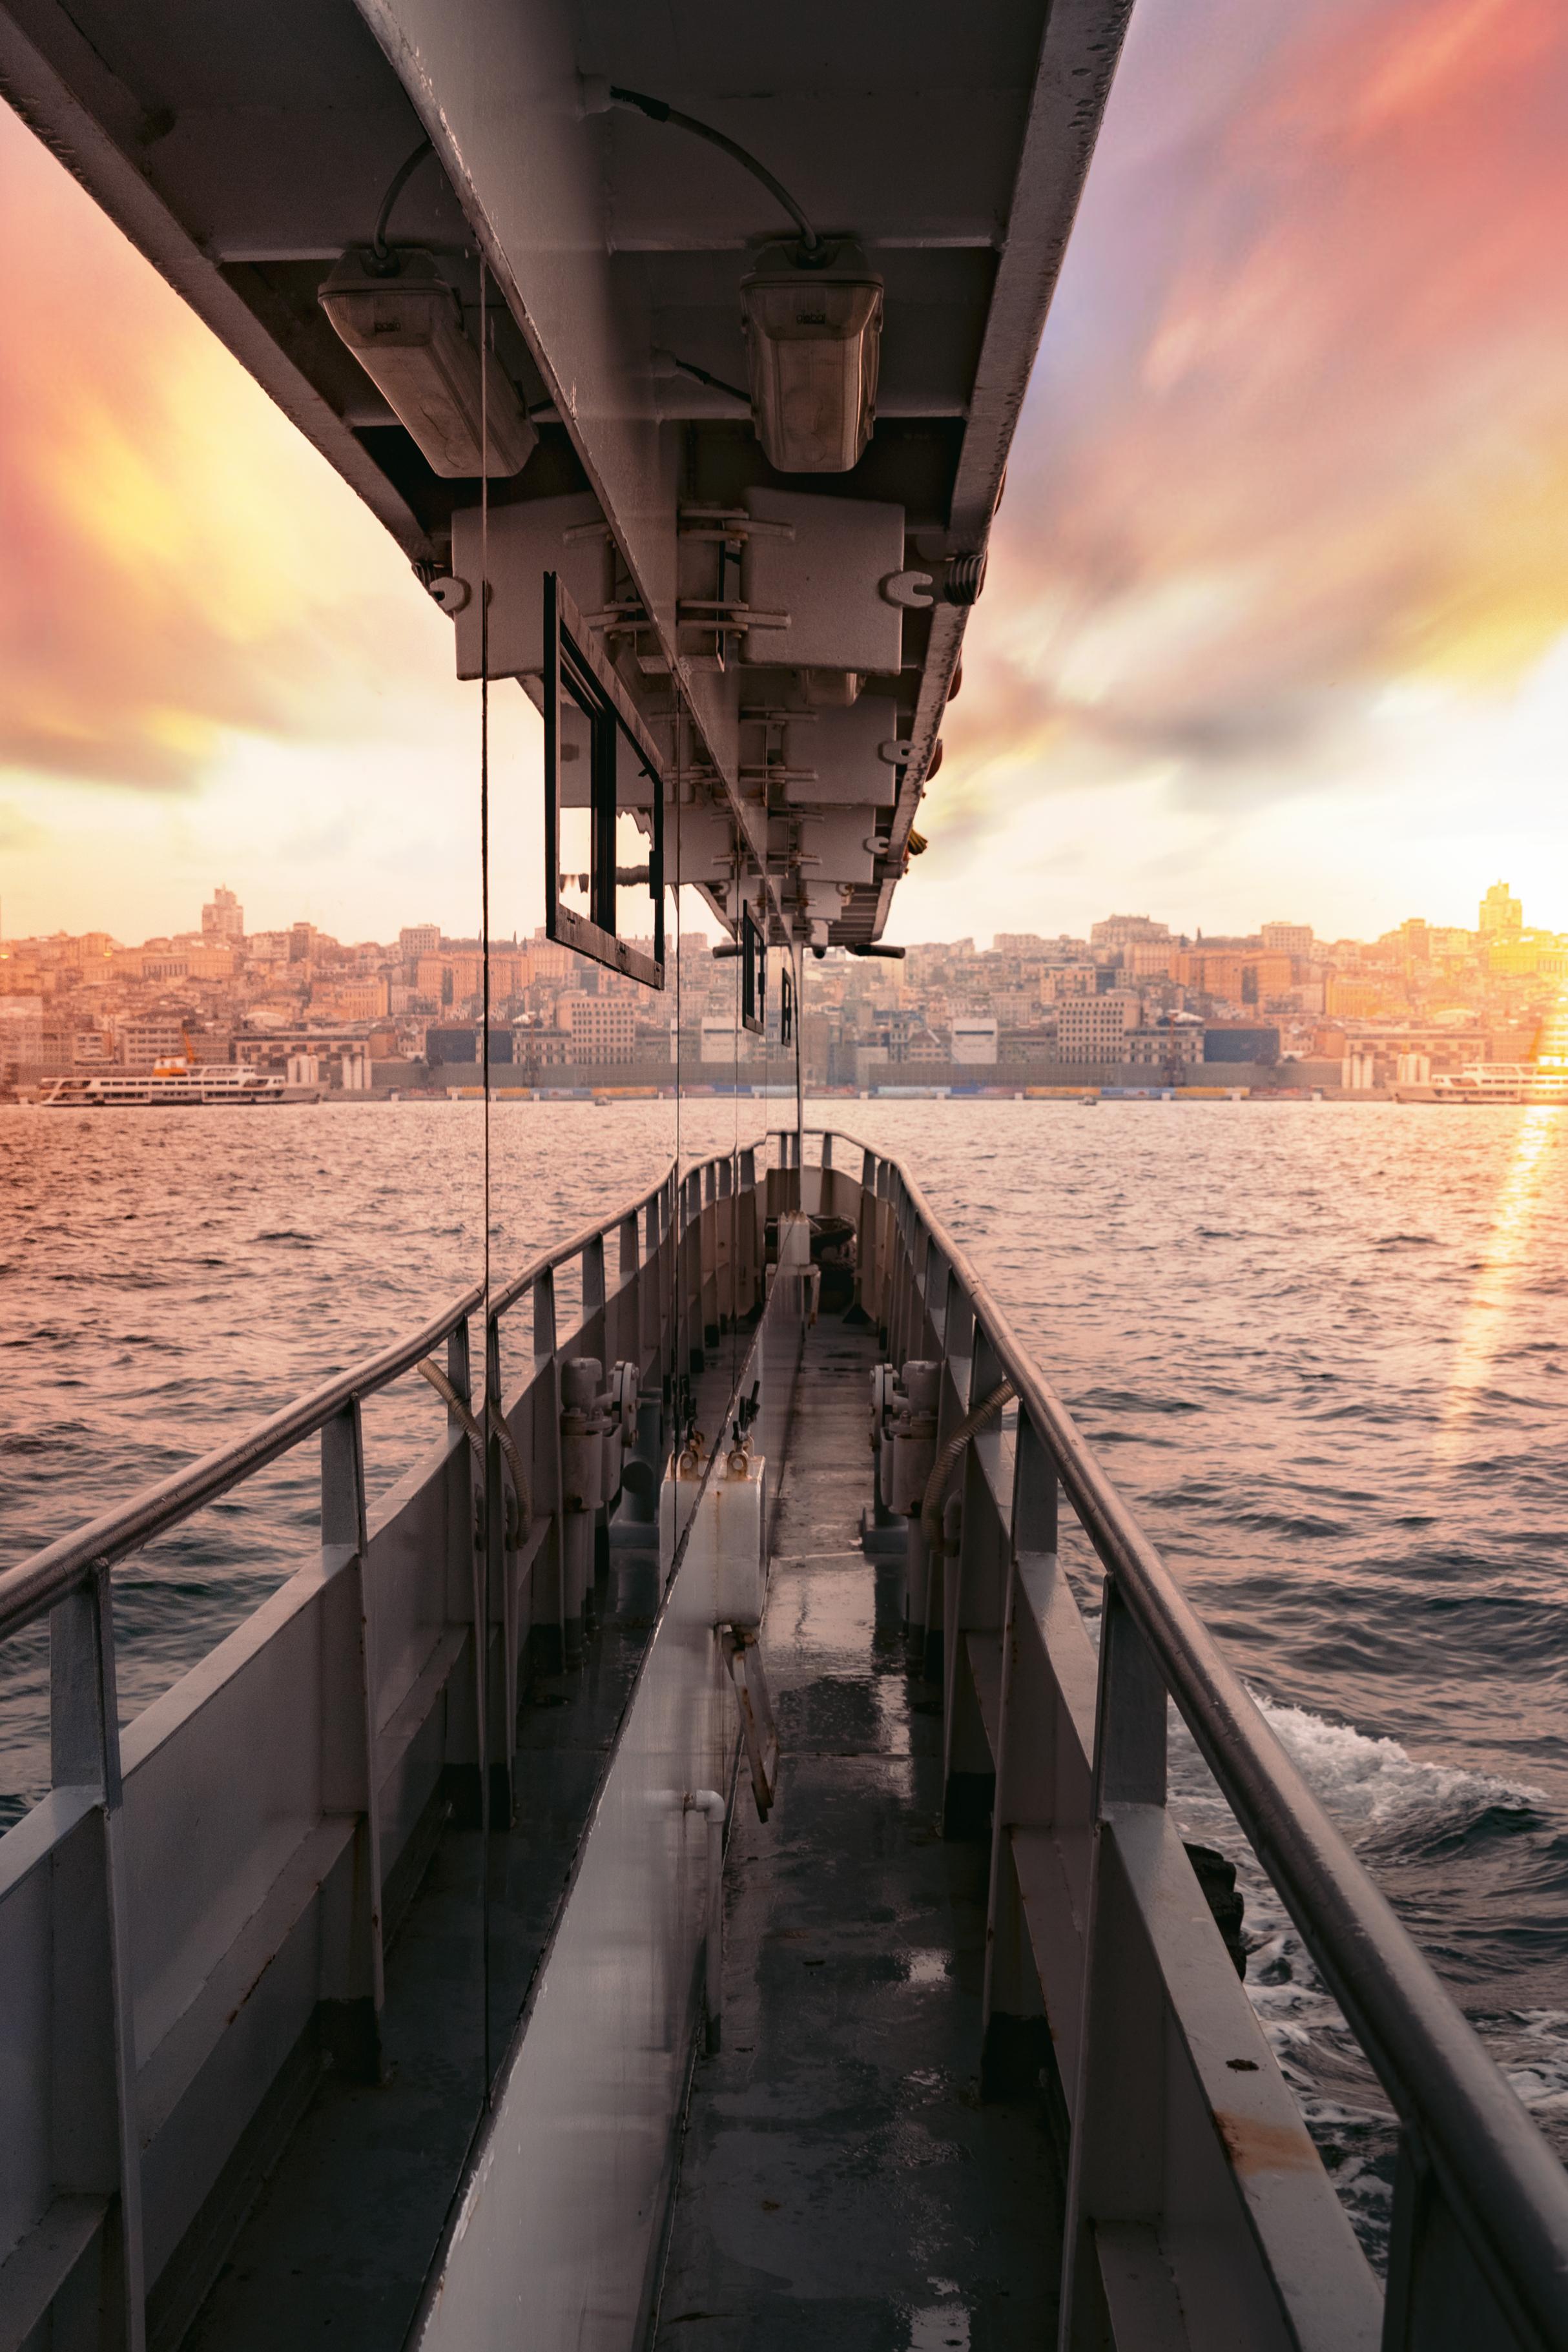 Boat-ORG.jpg